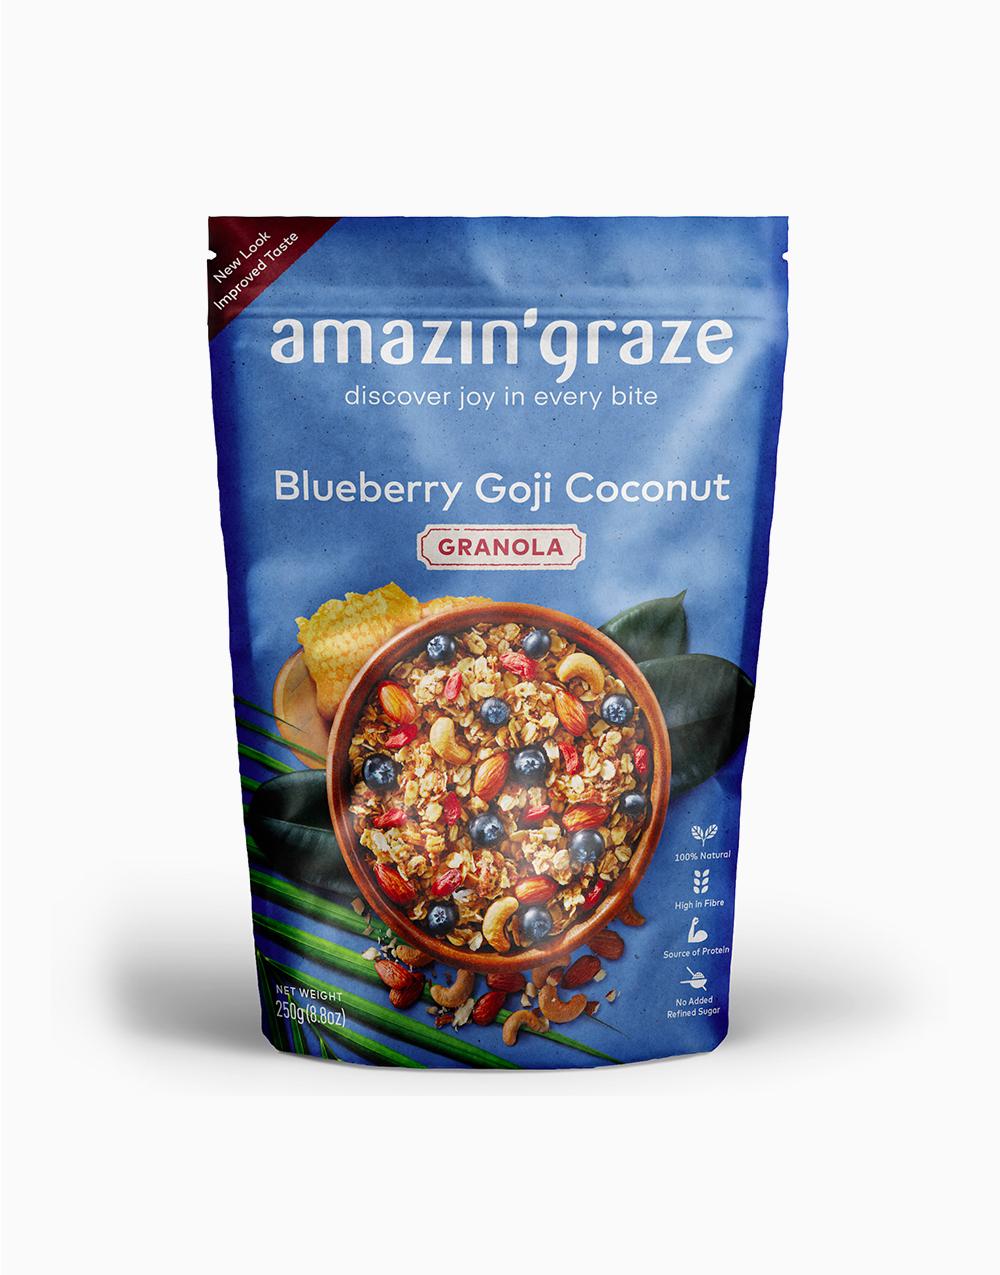 Breakfast Bundle: Blueberry & Banana by Amazin' Graze